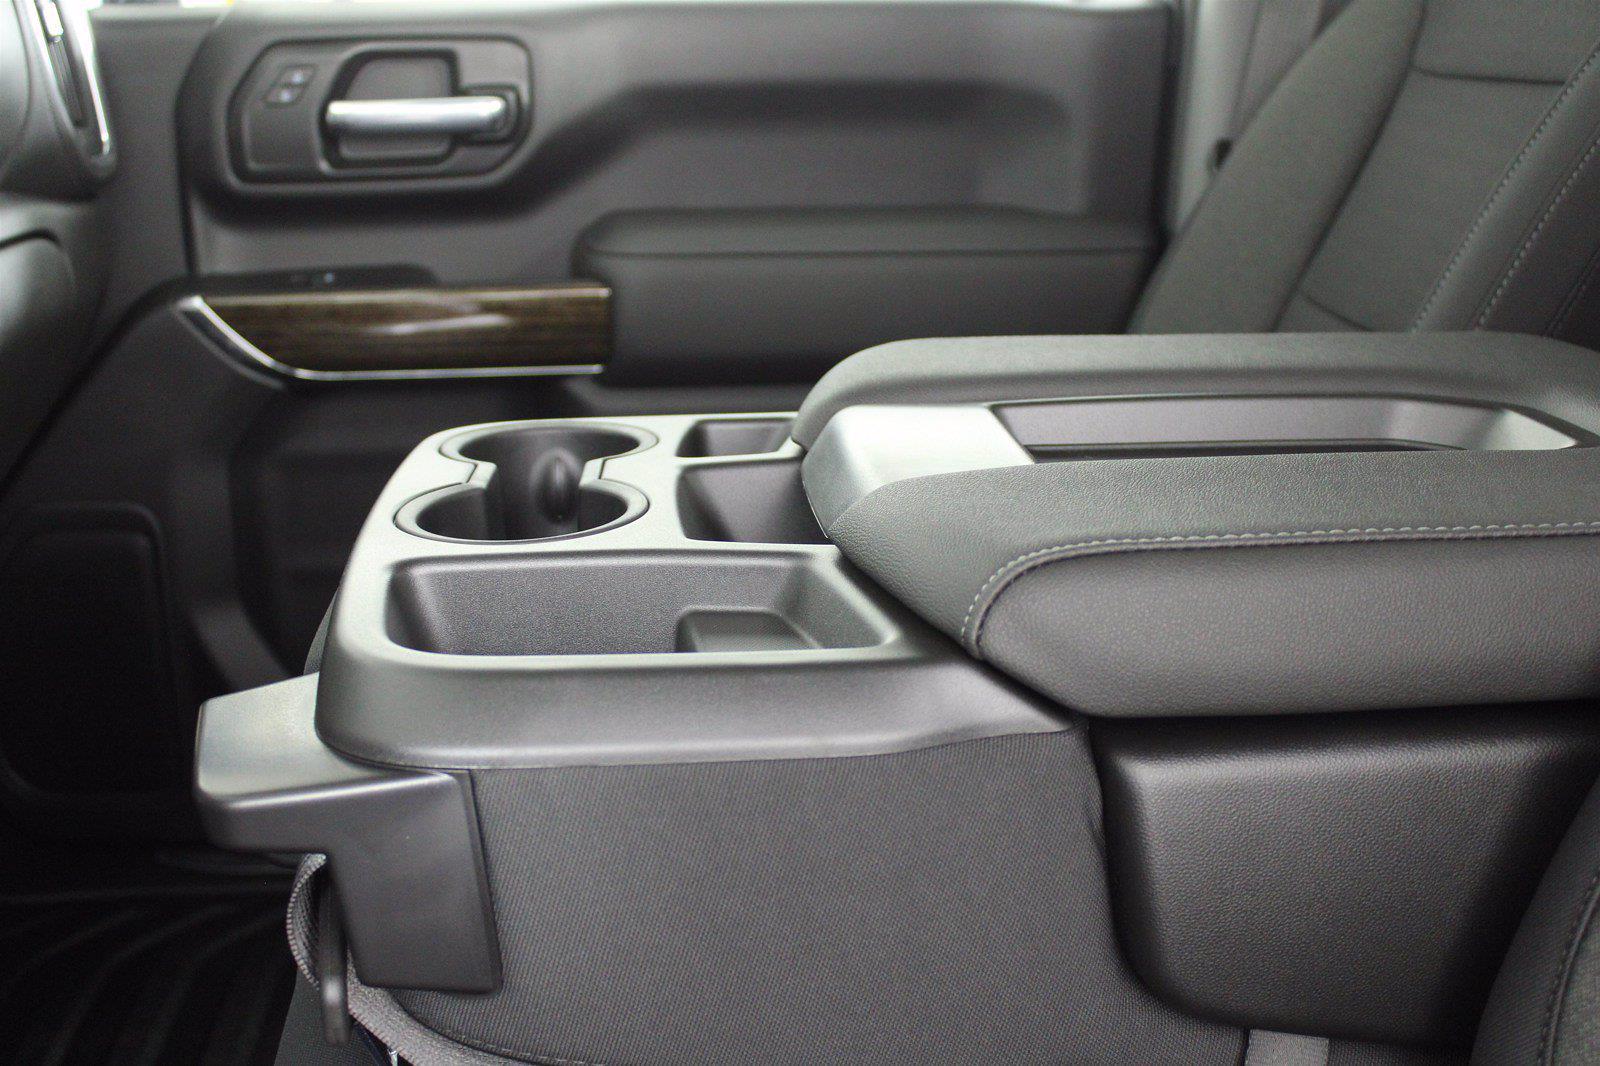 2022 Sierra 2500 Regular Cab 4x4,  Pickup #D420023 - photo 13